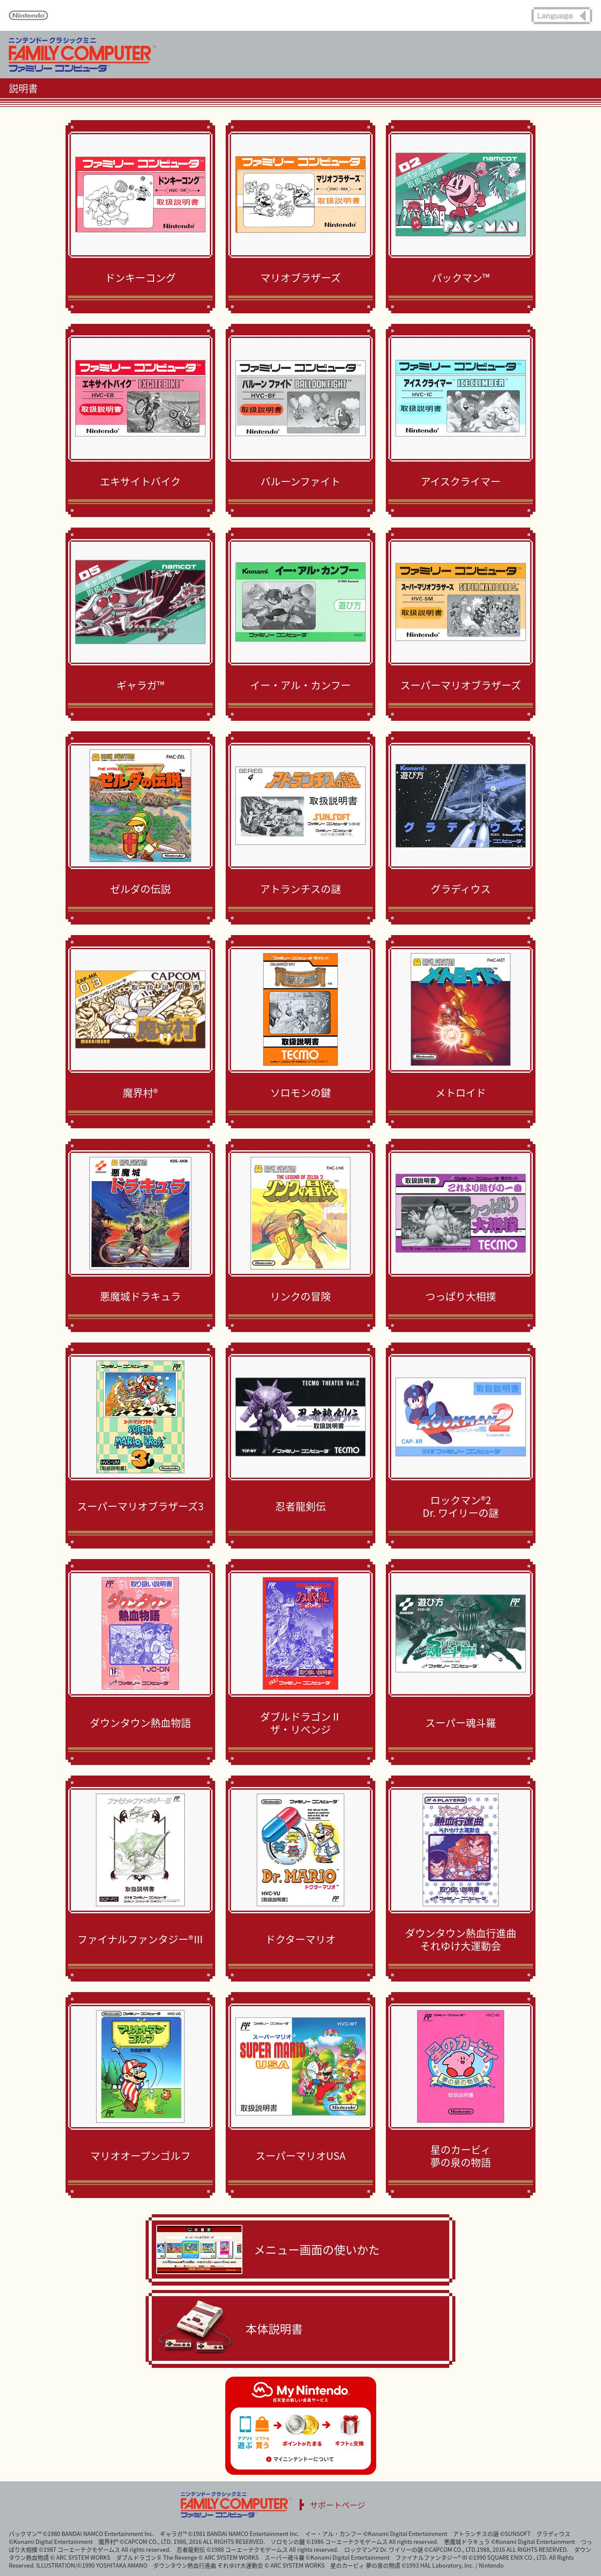 Famicom Classic Edition manuals